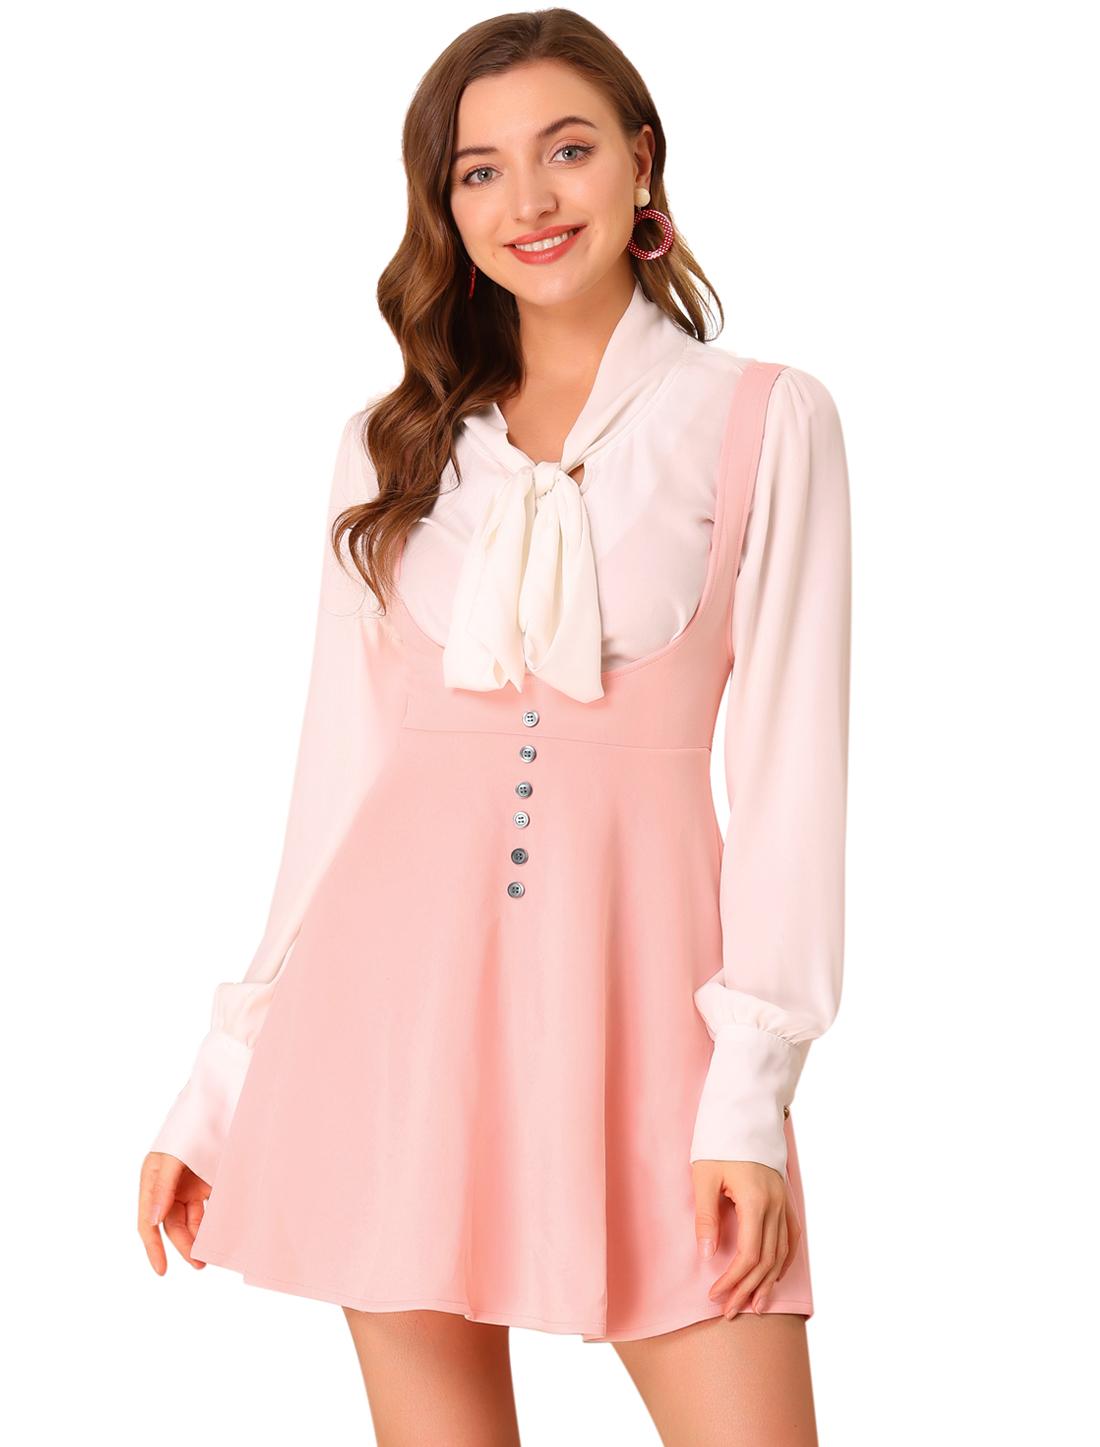 Allegra K Women Button Decor Flared Hem Above Knee Dress Suspender Skirt Pink M